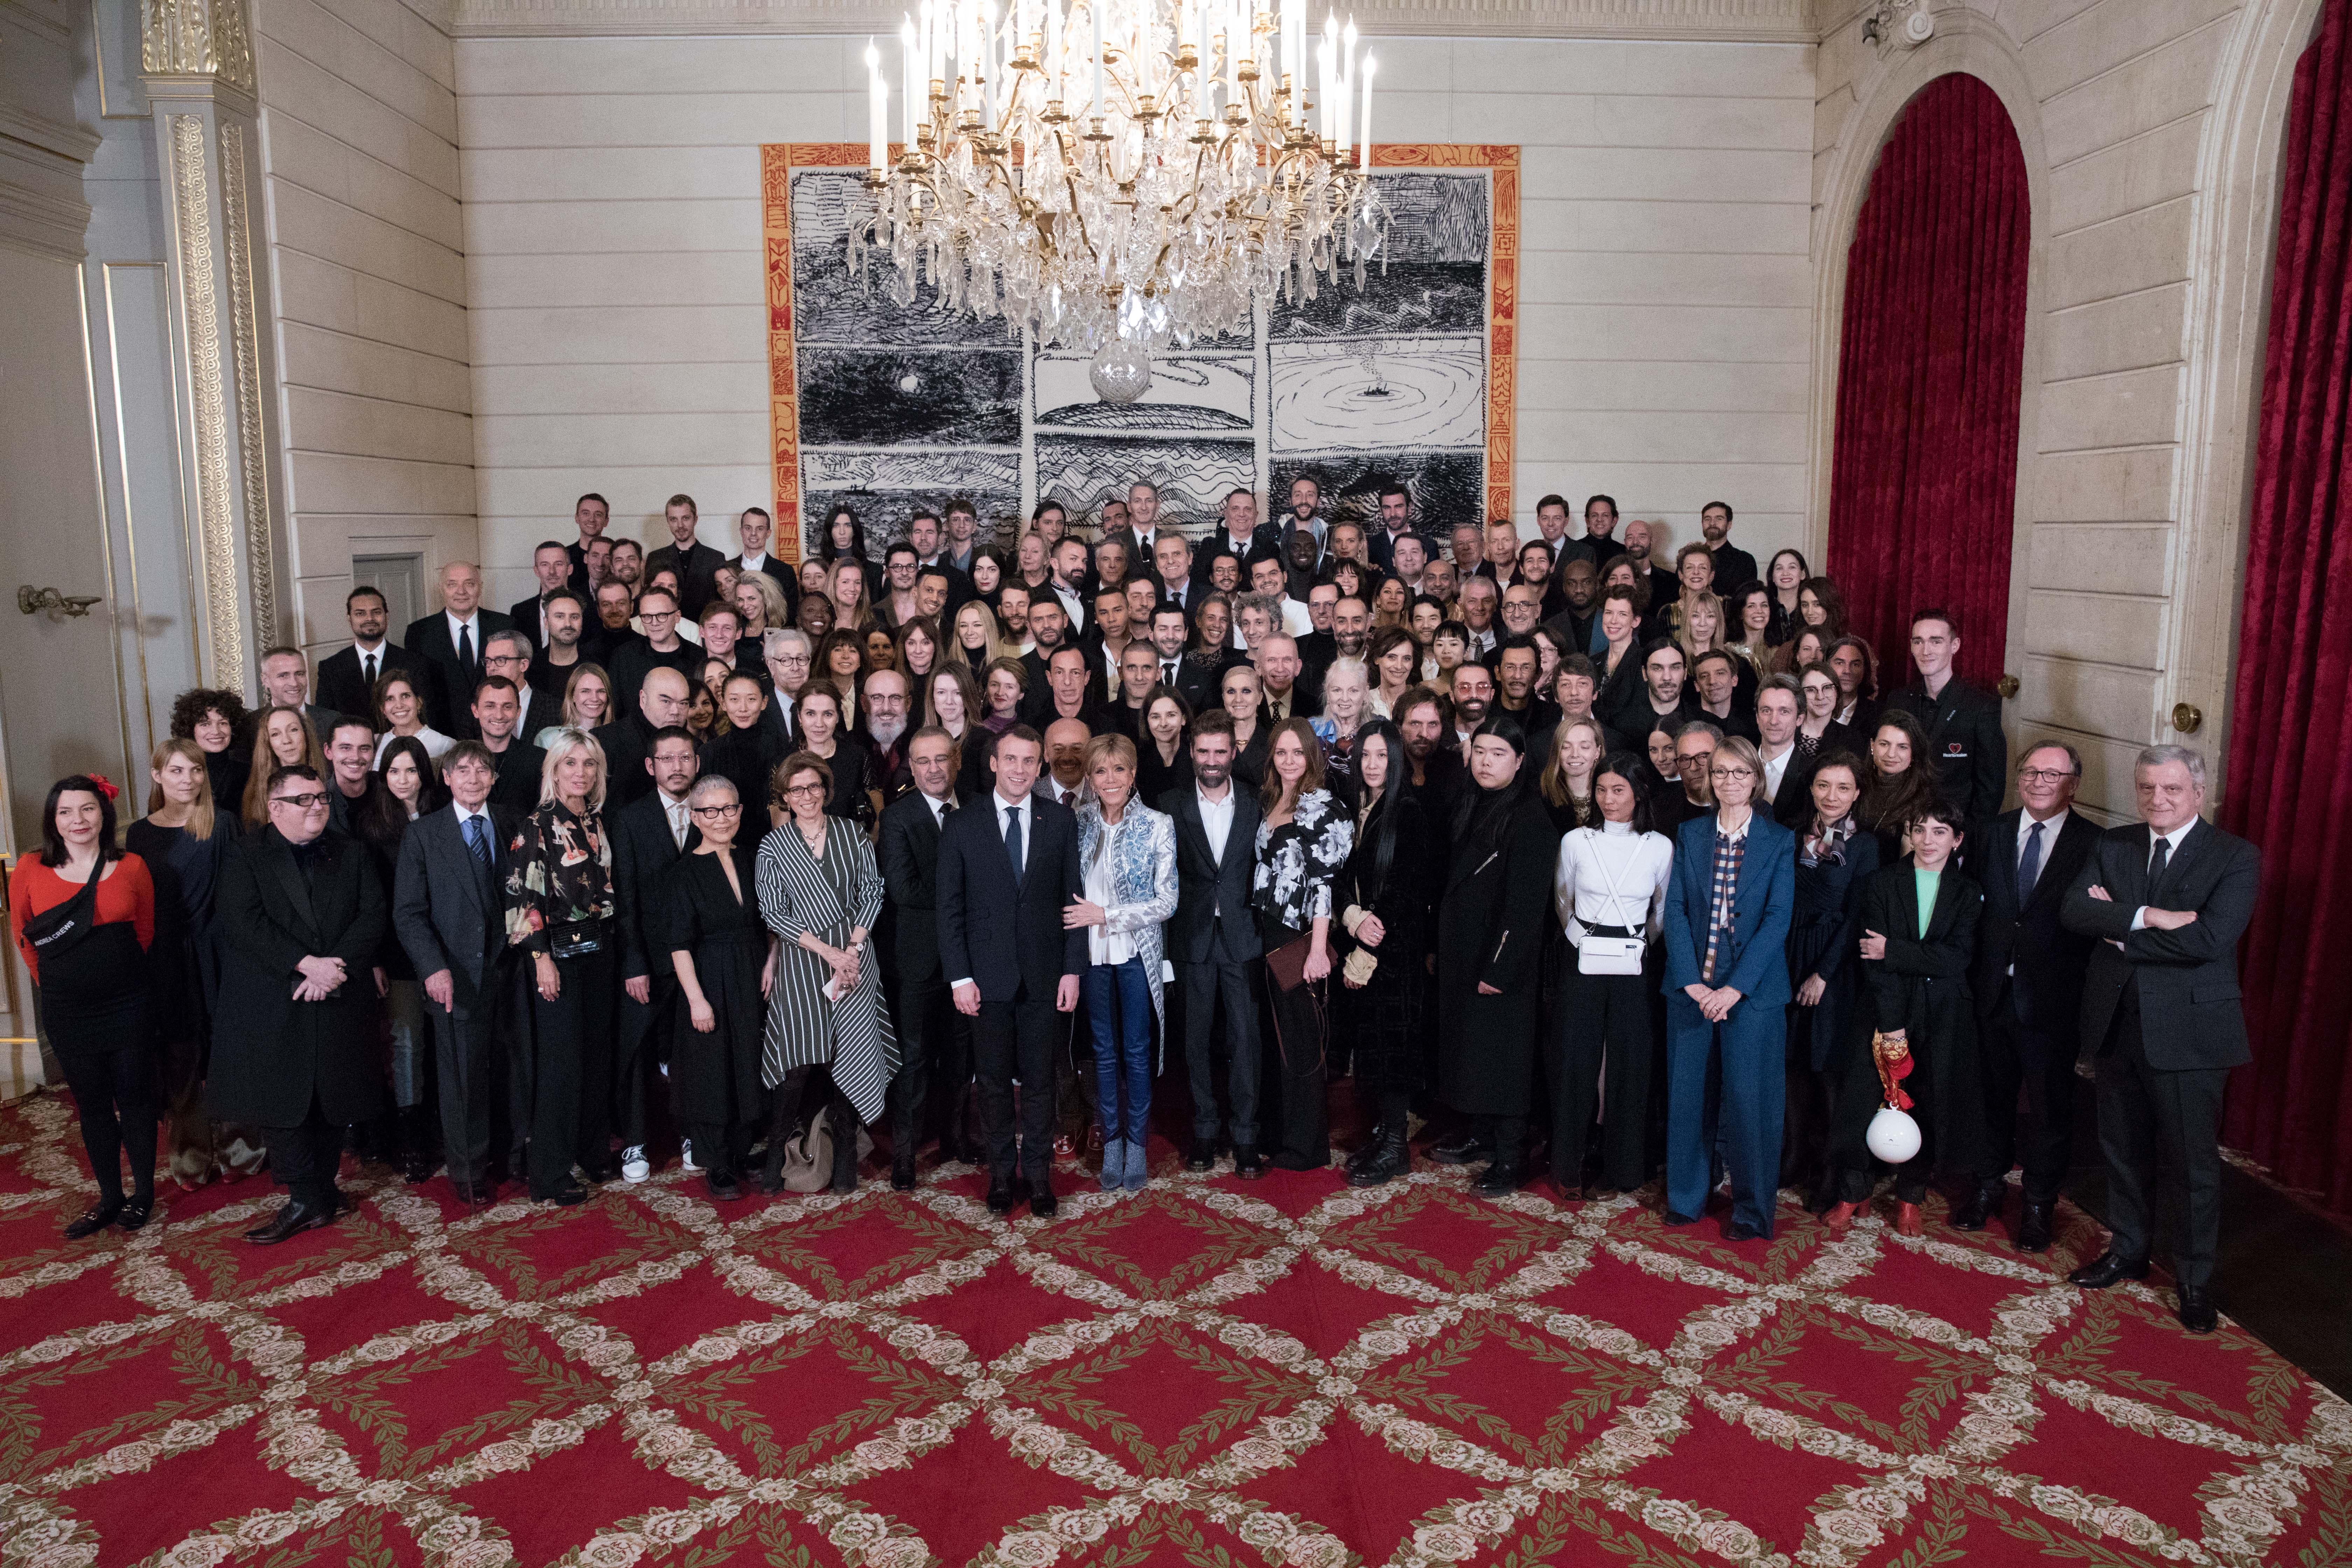 Paris fashion industry at the Élysée dinner